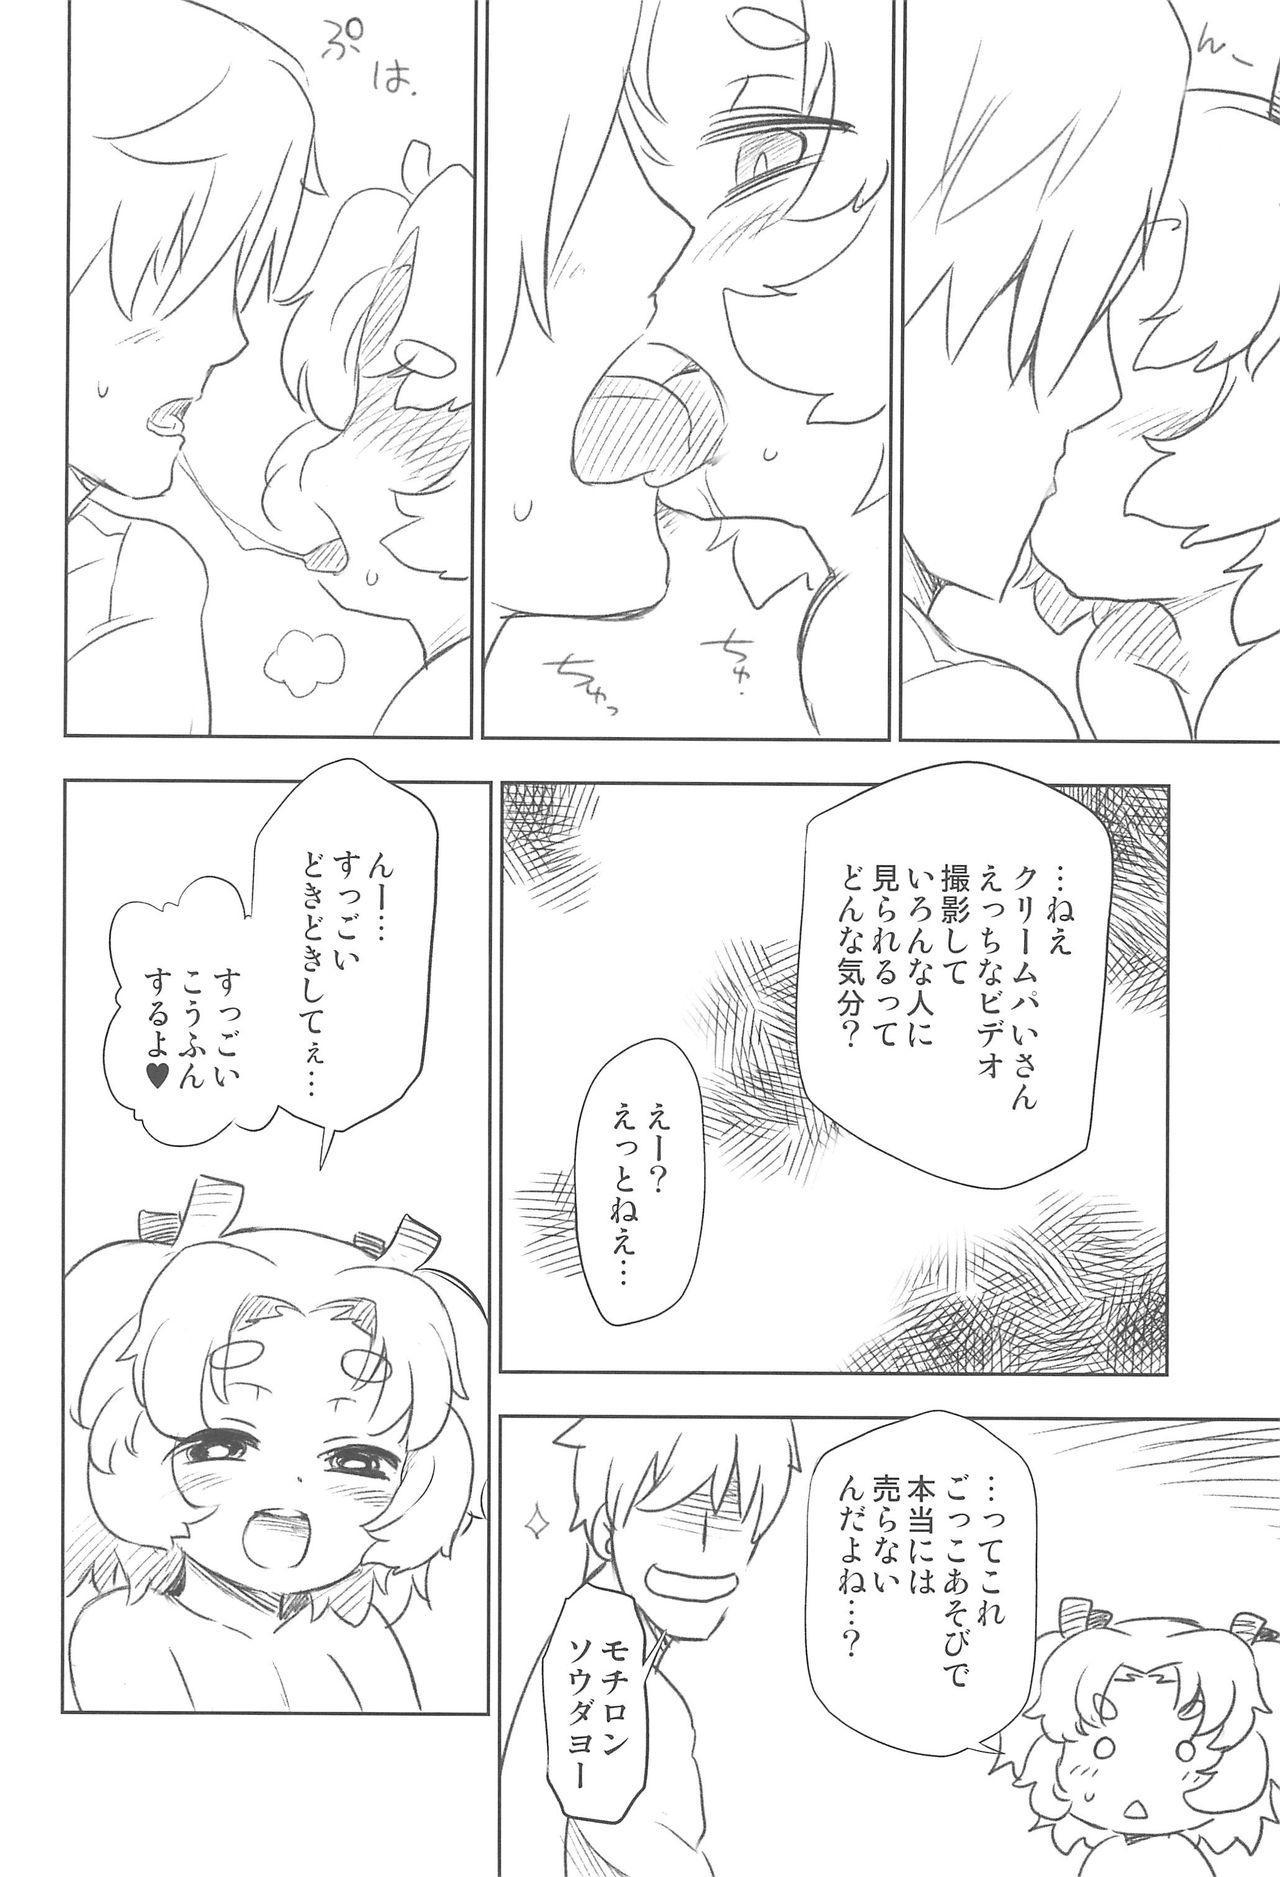 Petit Dolls VOL. 9 Creampie-san Torotoro Amaai Nakadashi Girl 11